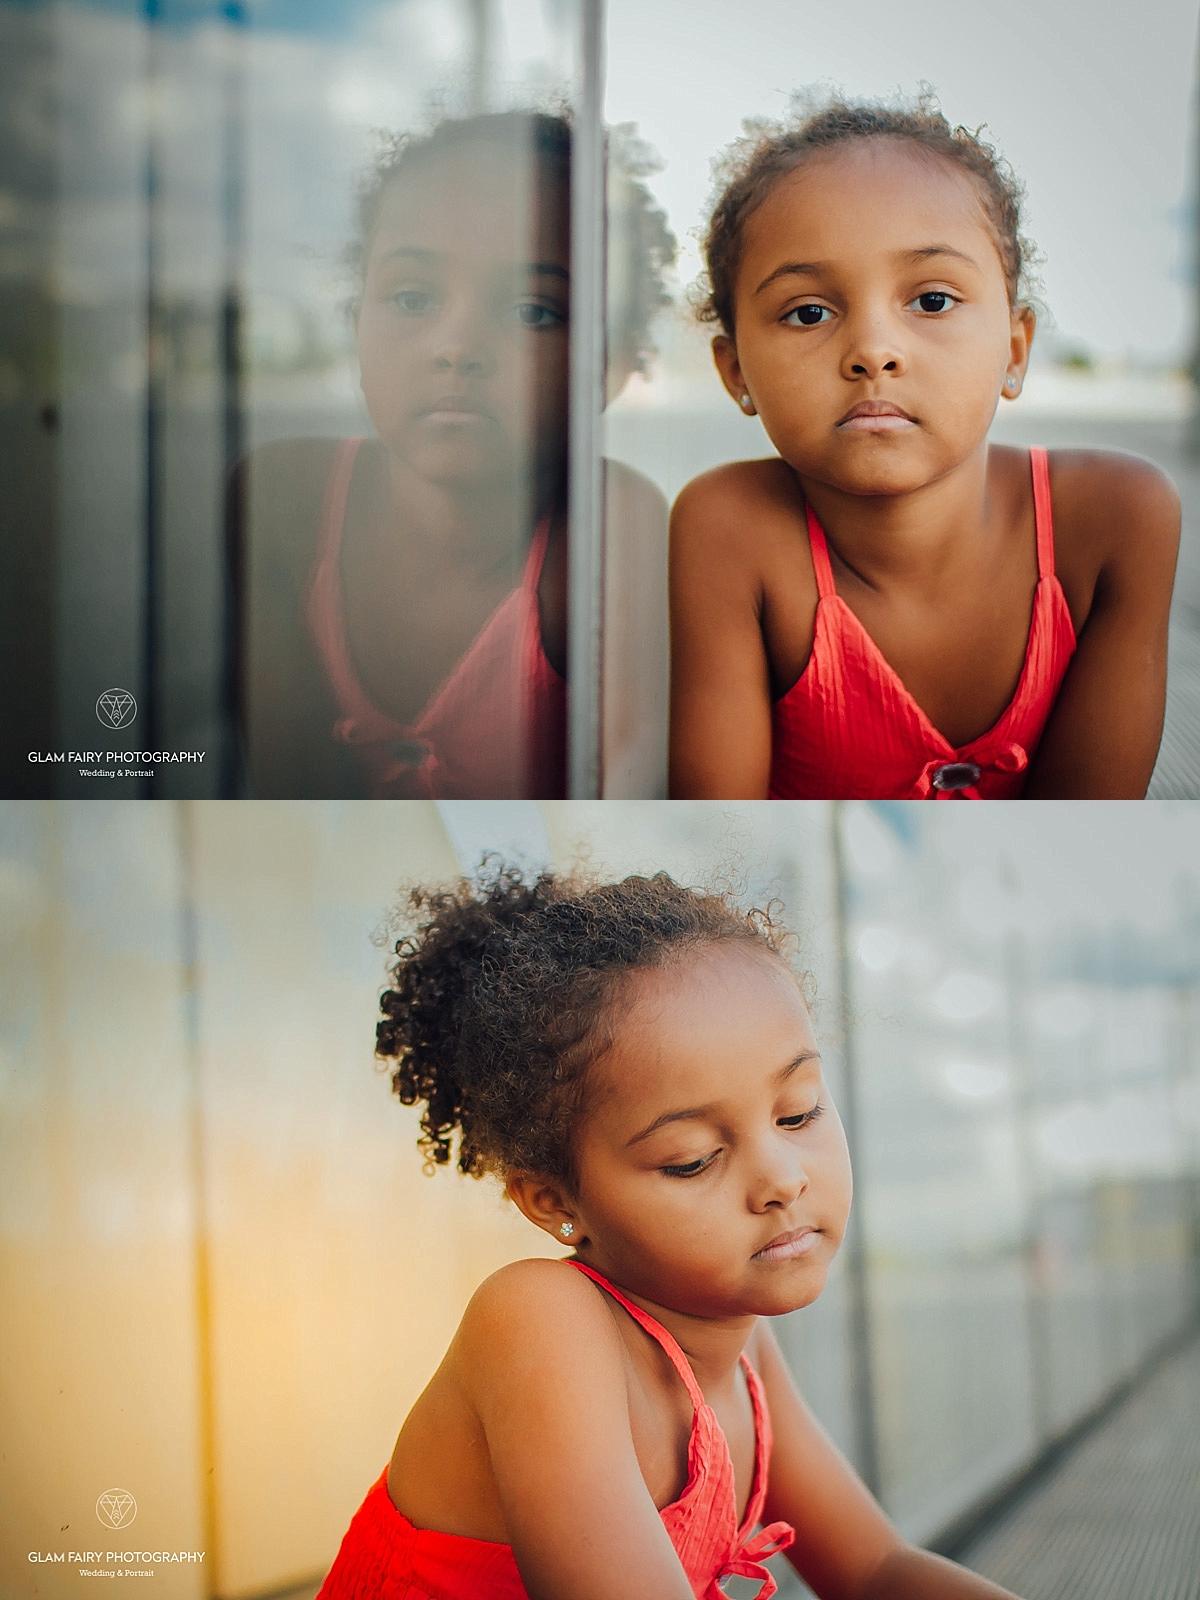 GlamFairyPhotography-séance-photo-enfant-bnf-yaelle_0014